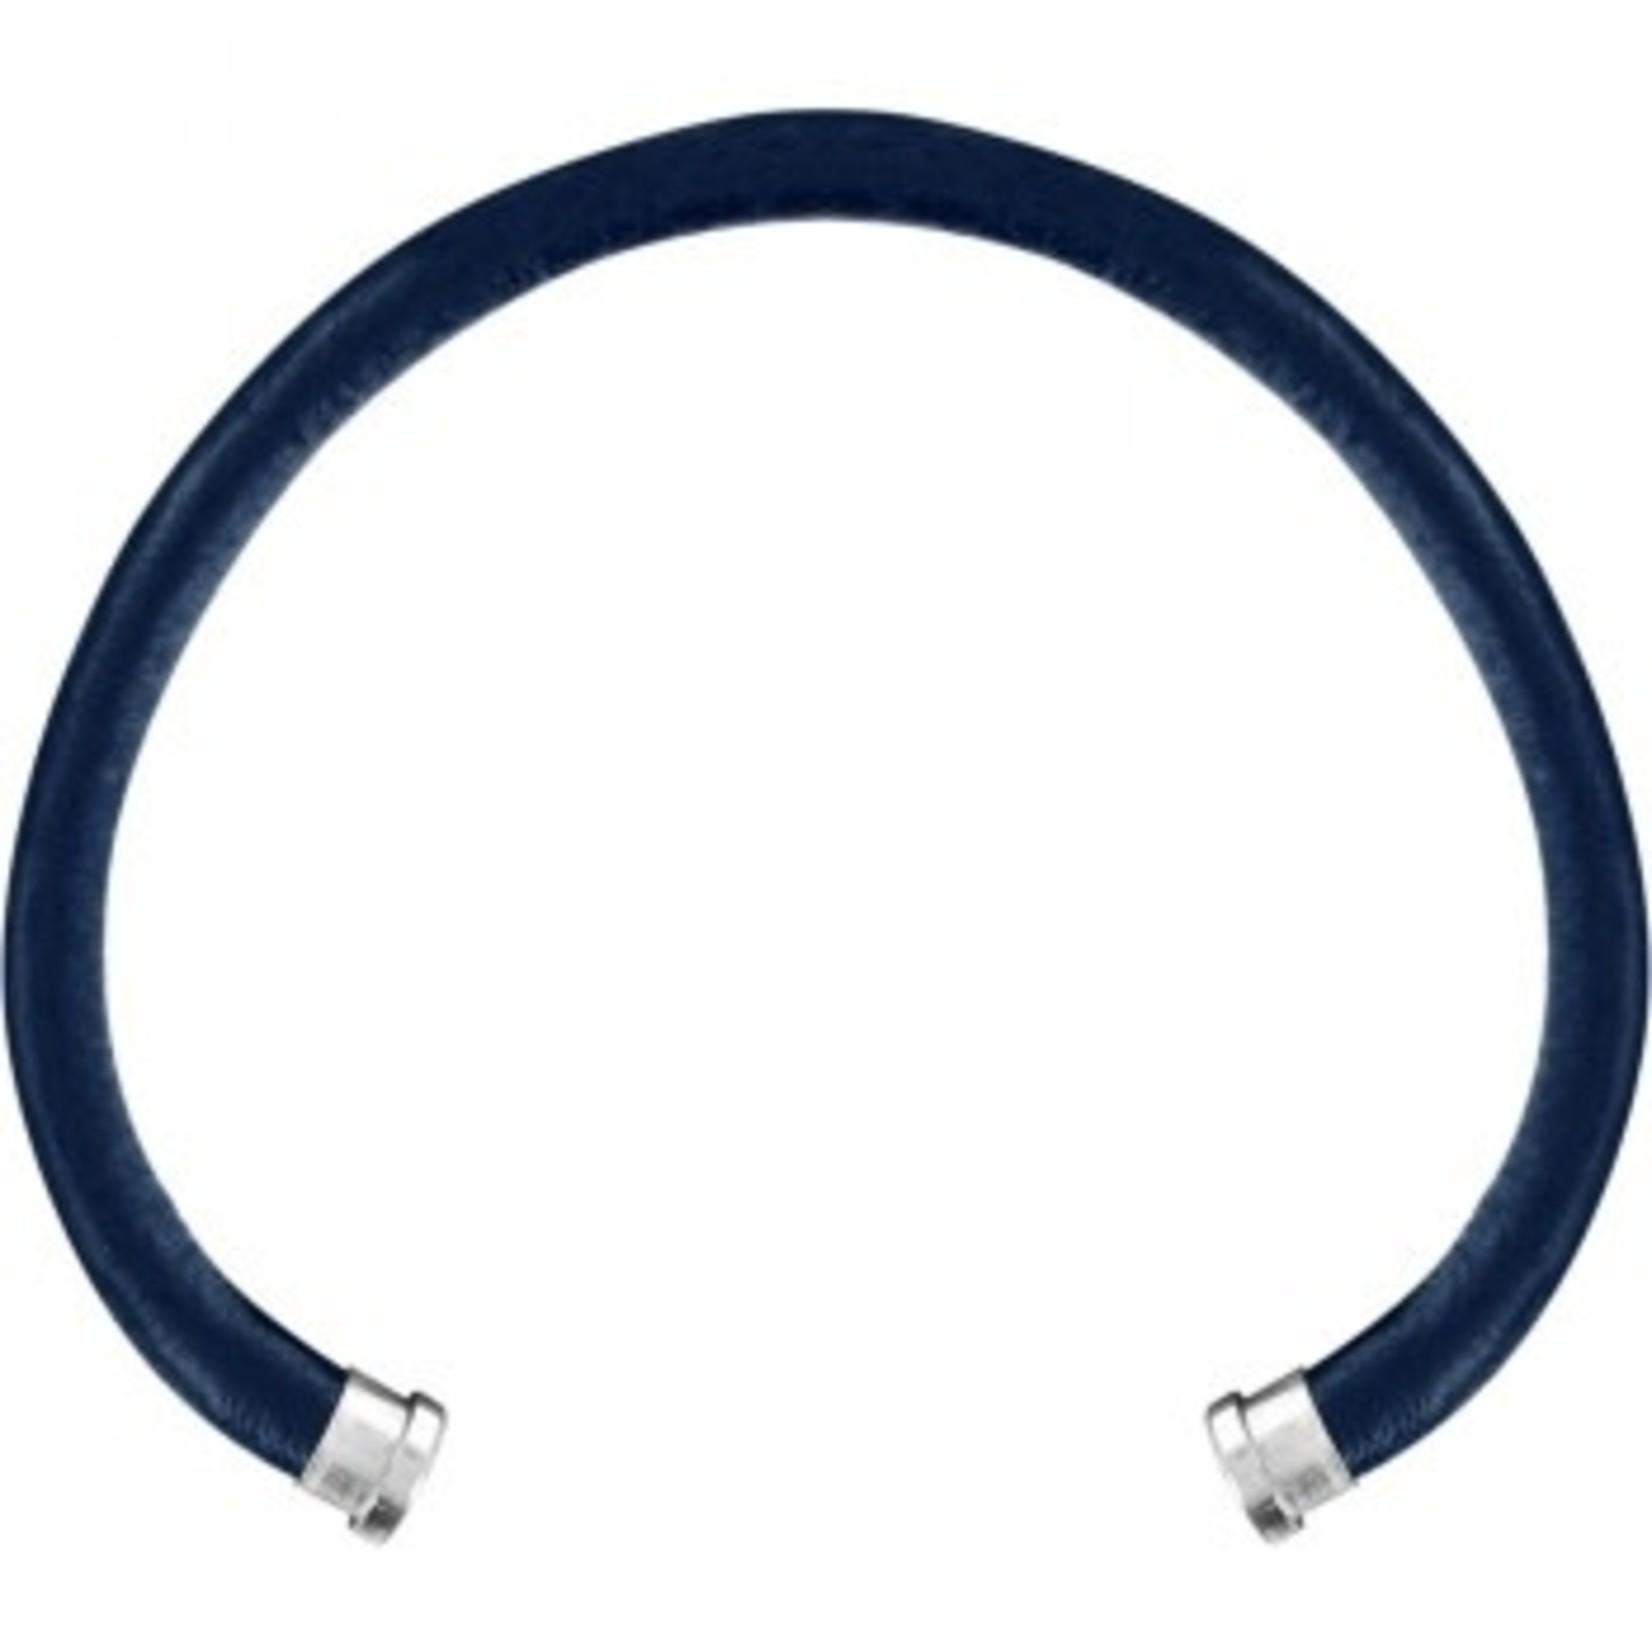 Brighton Color Clique Leather Cord in Navy S/M